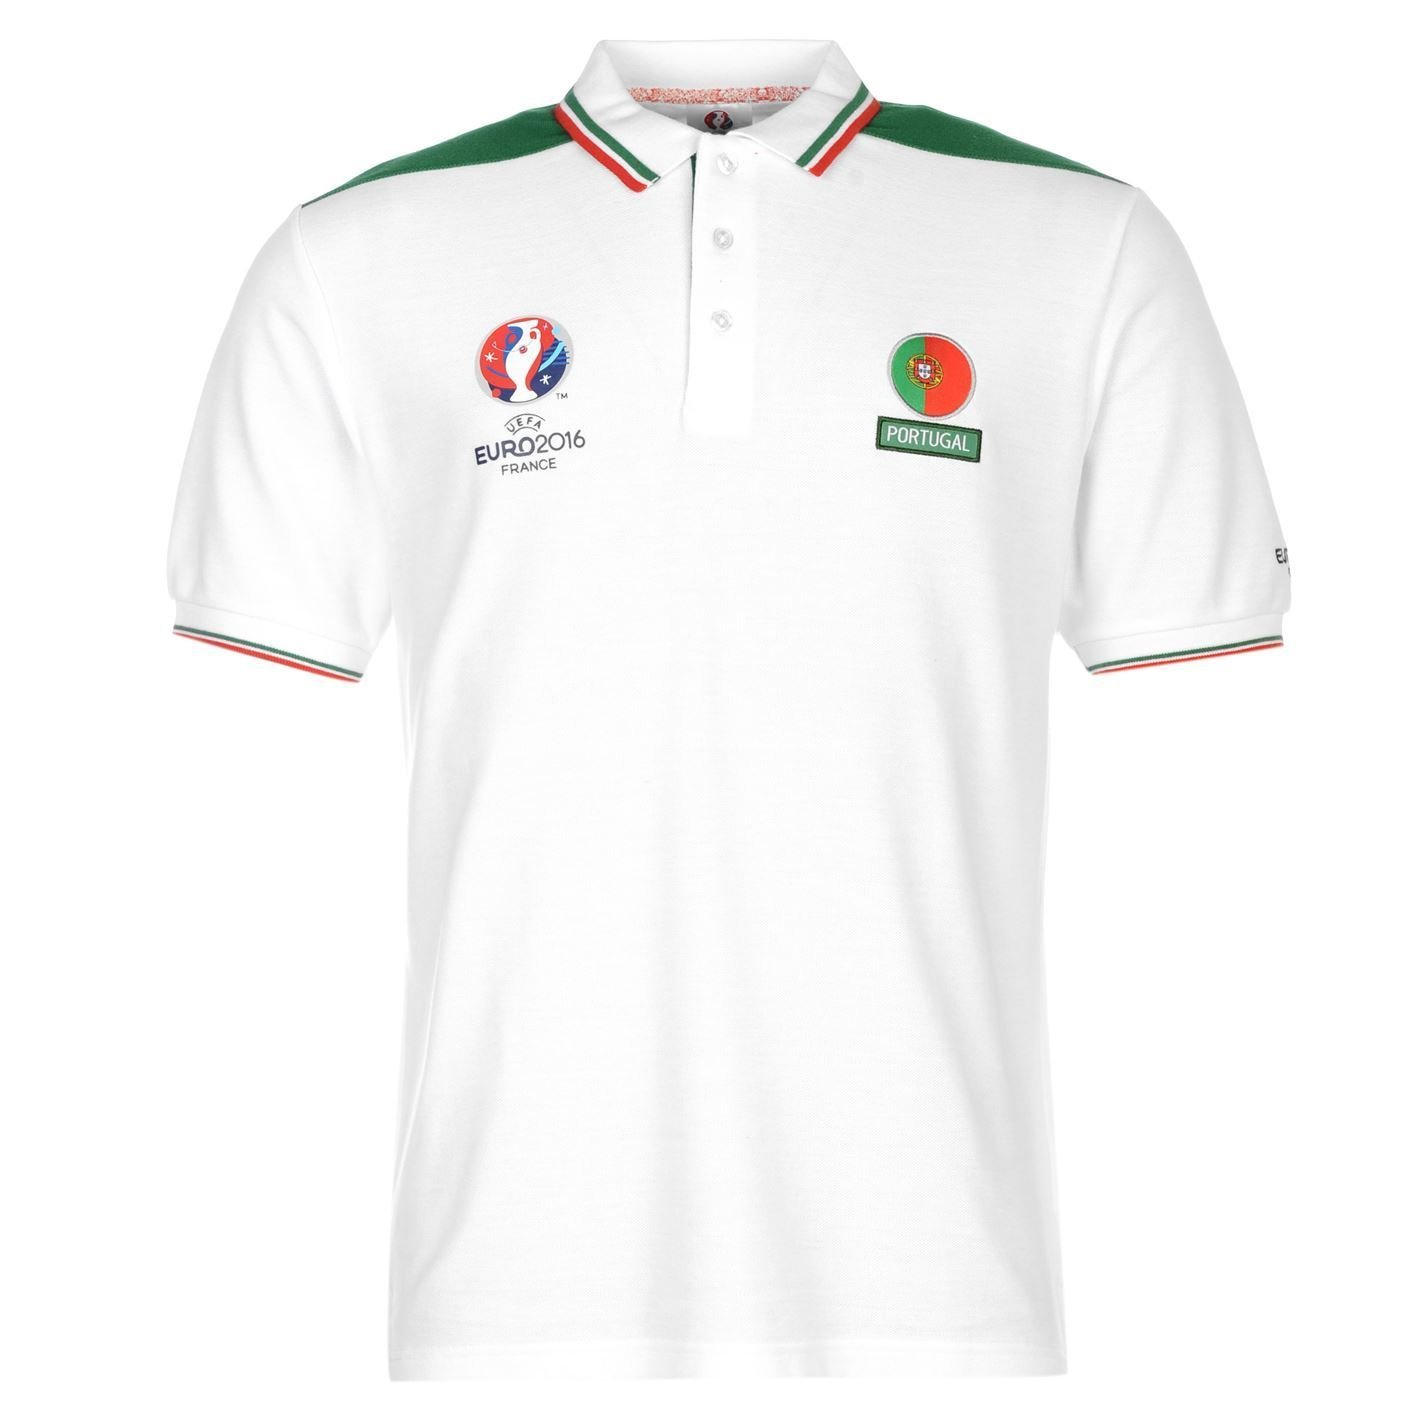 UEFA Euro 2016ポルトガルポロシャツメンズホワイト/グリーンFootball Soccer Collared Top B01GKD6572Small